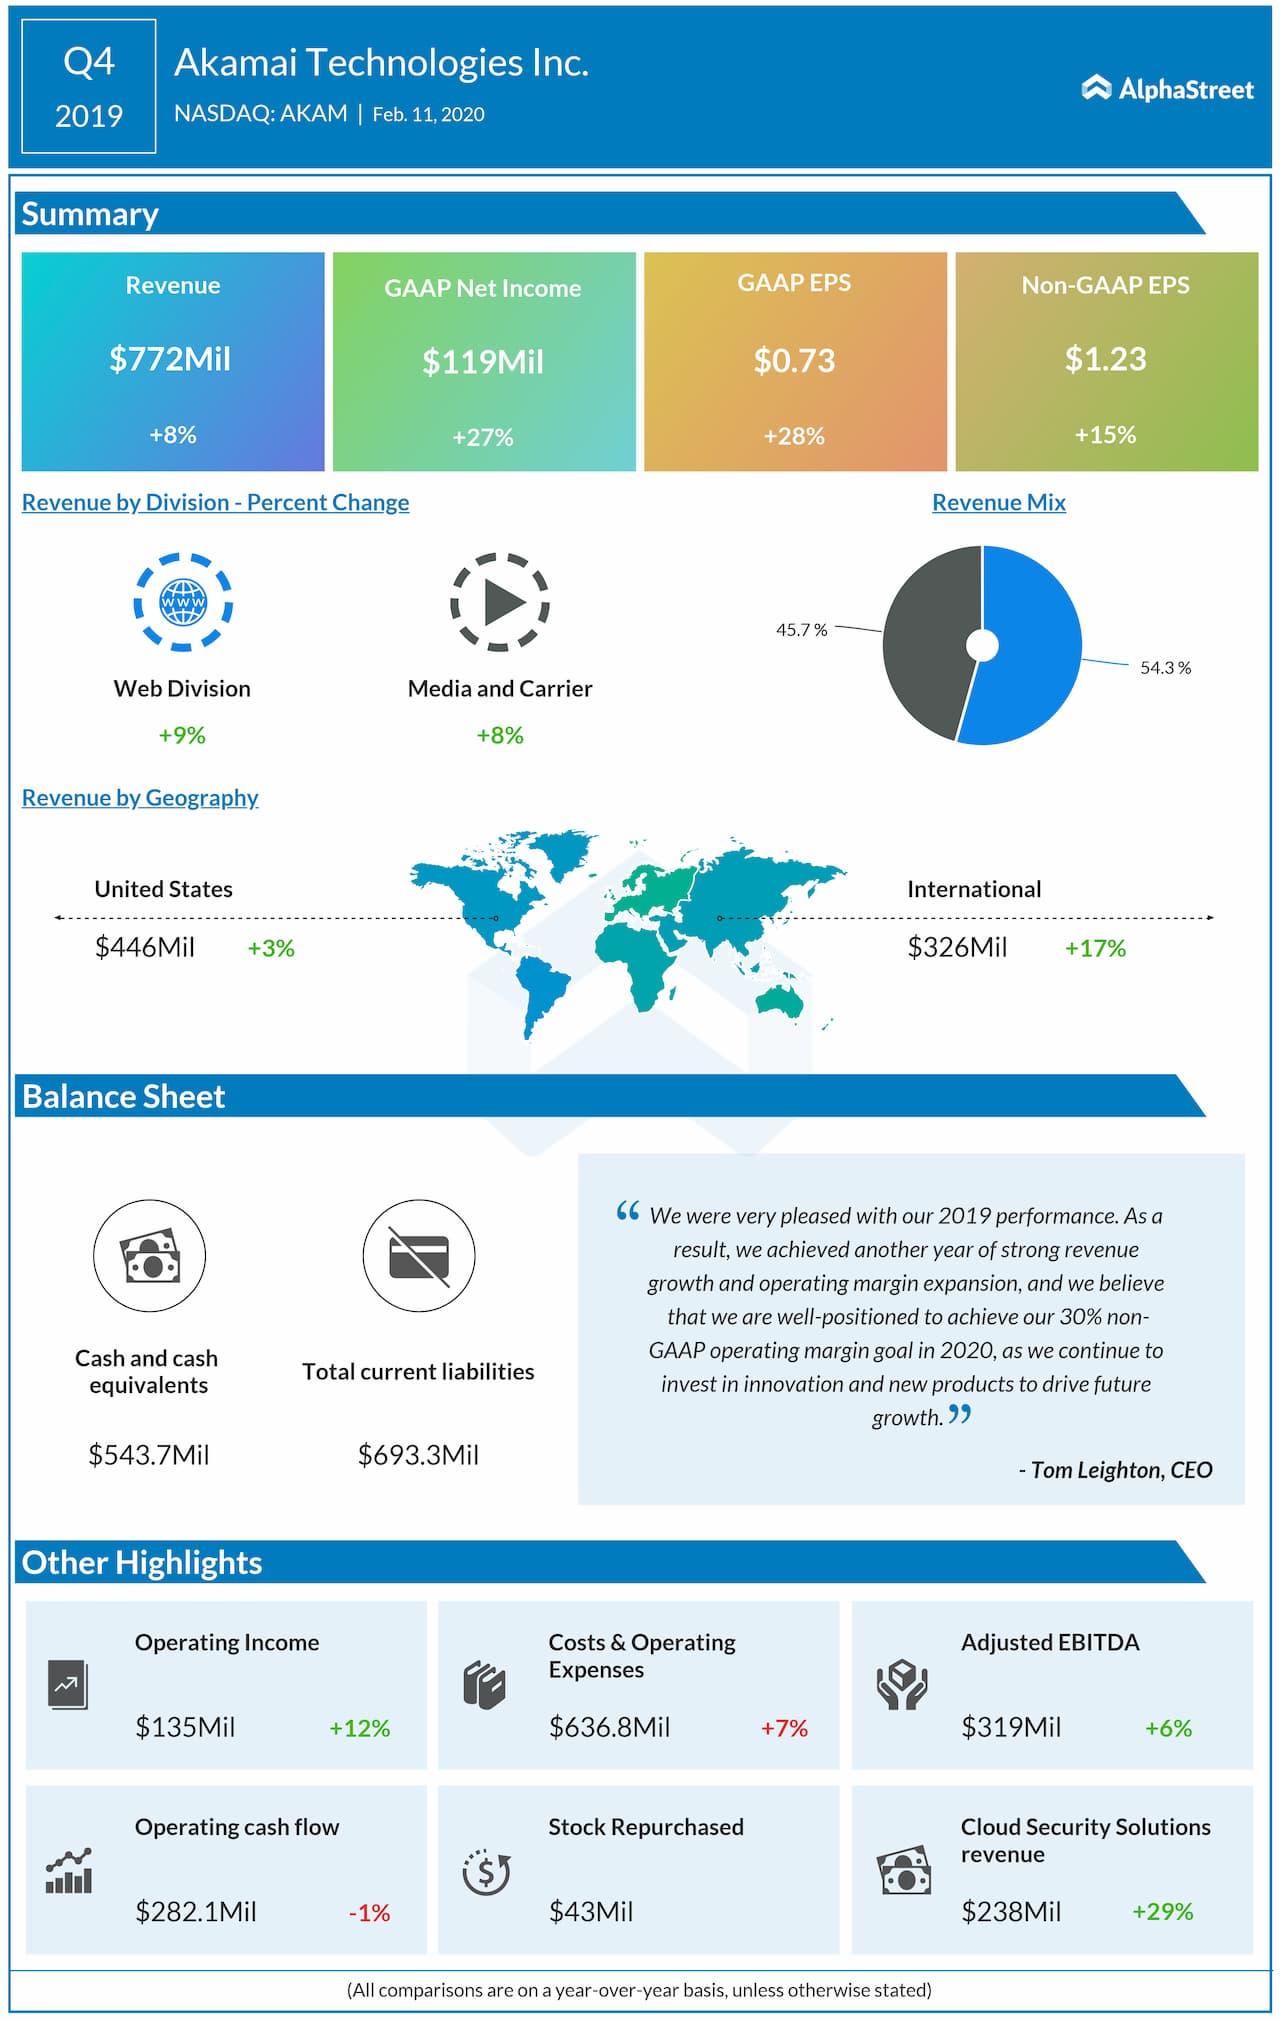 Akamai Technologies (AKAM) Q4 2019 earnings results